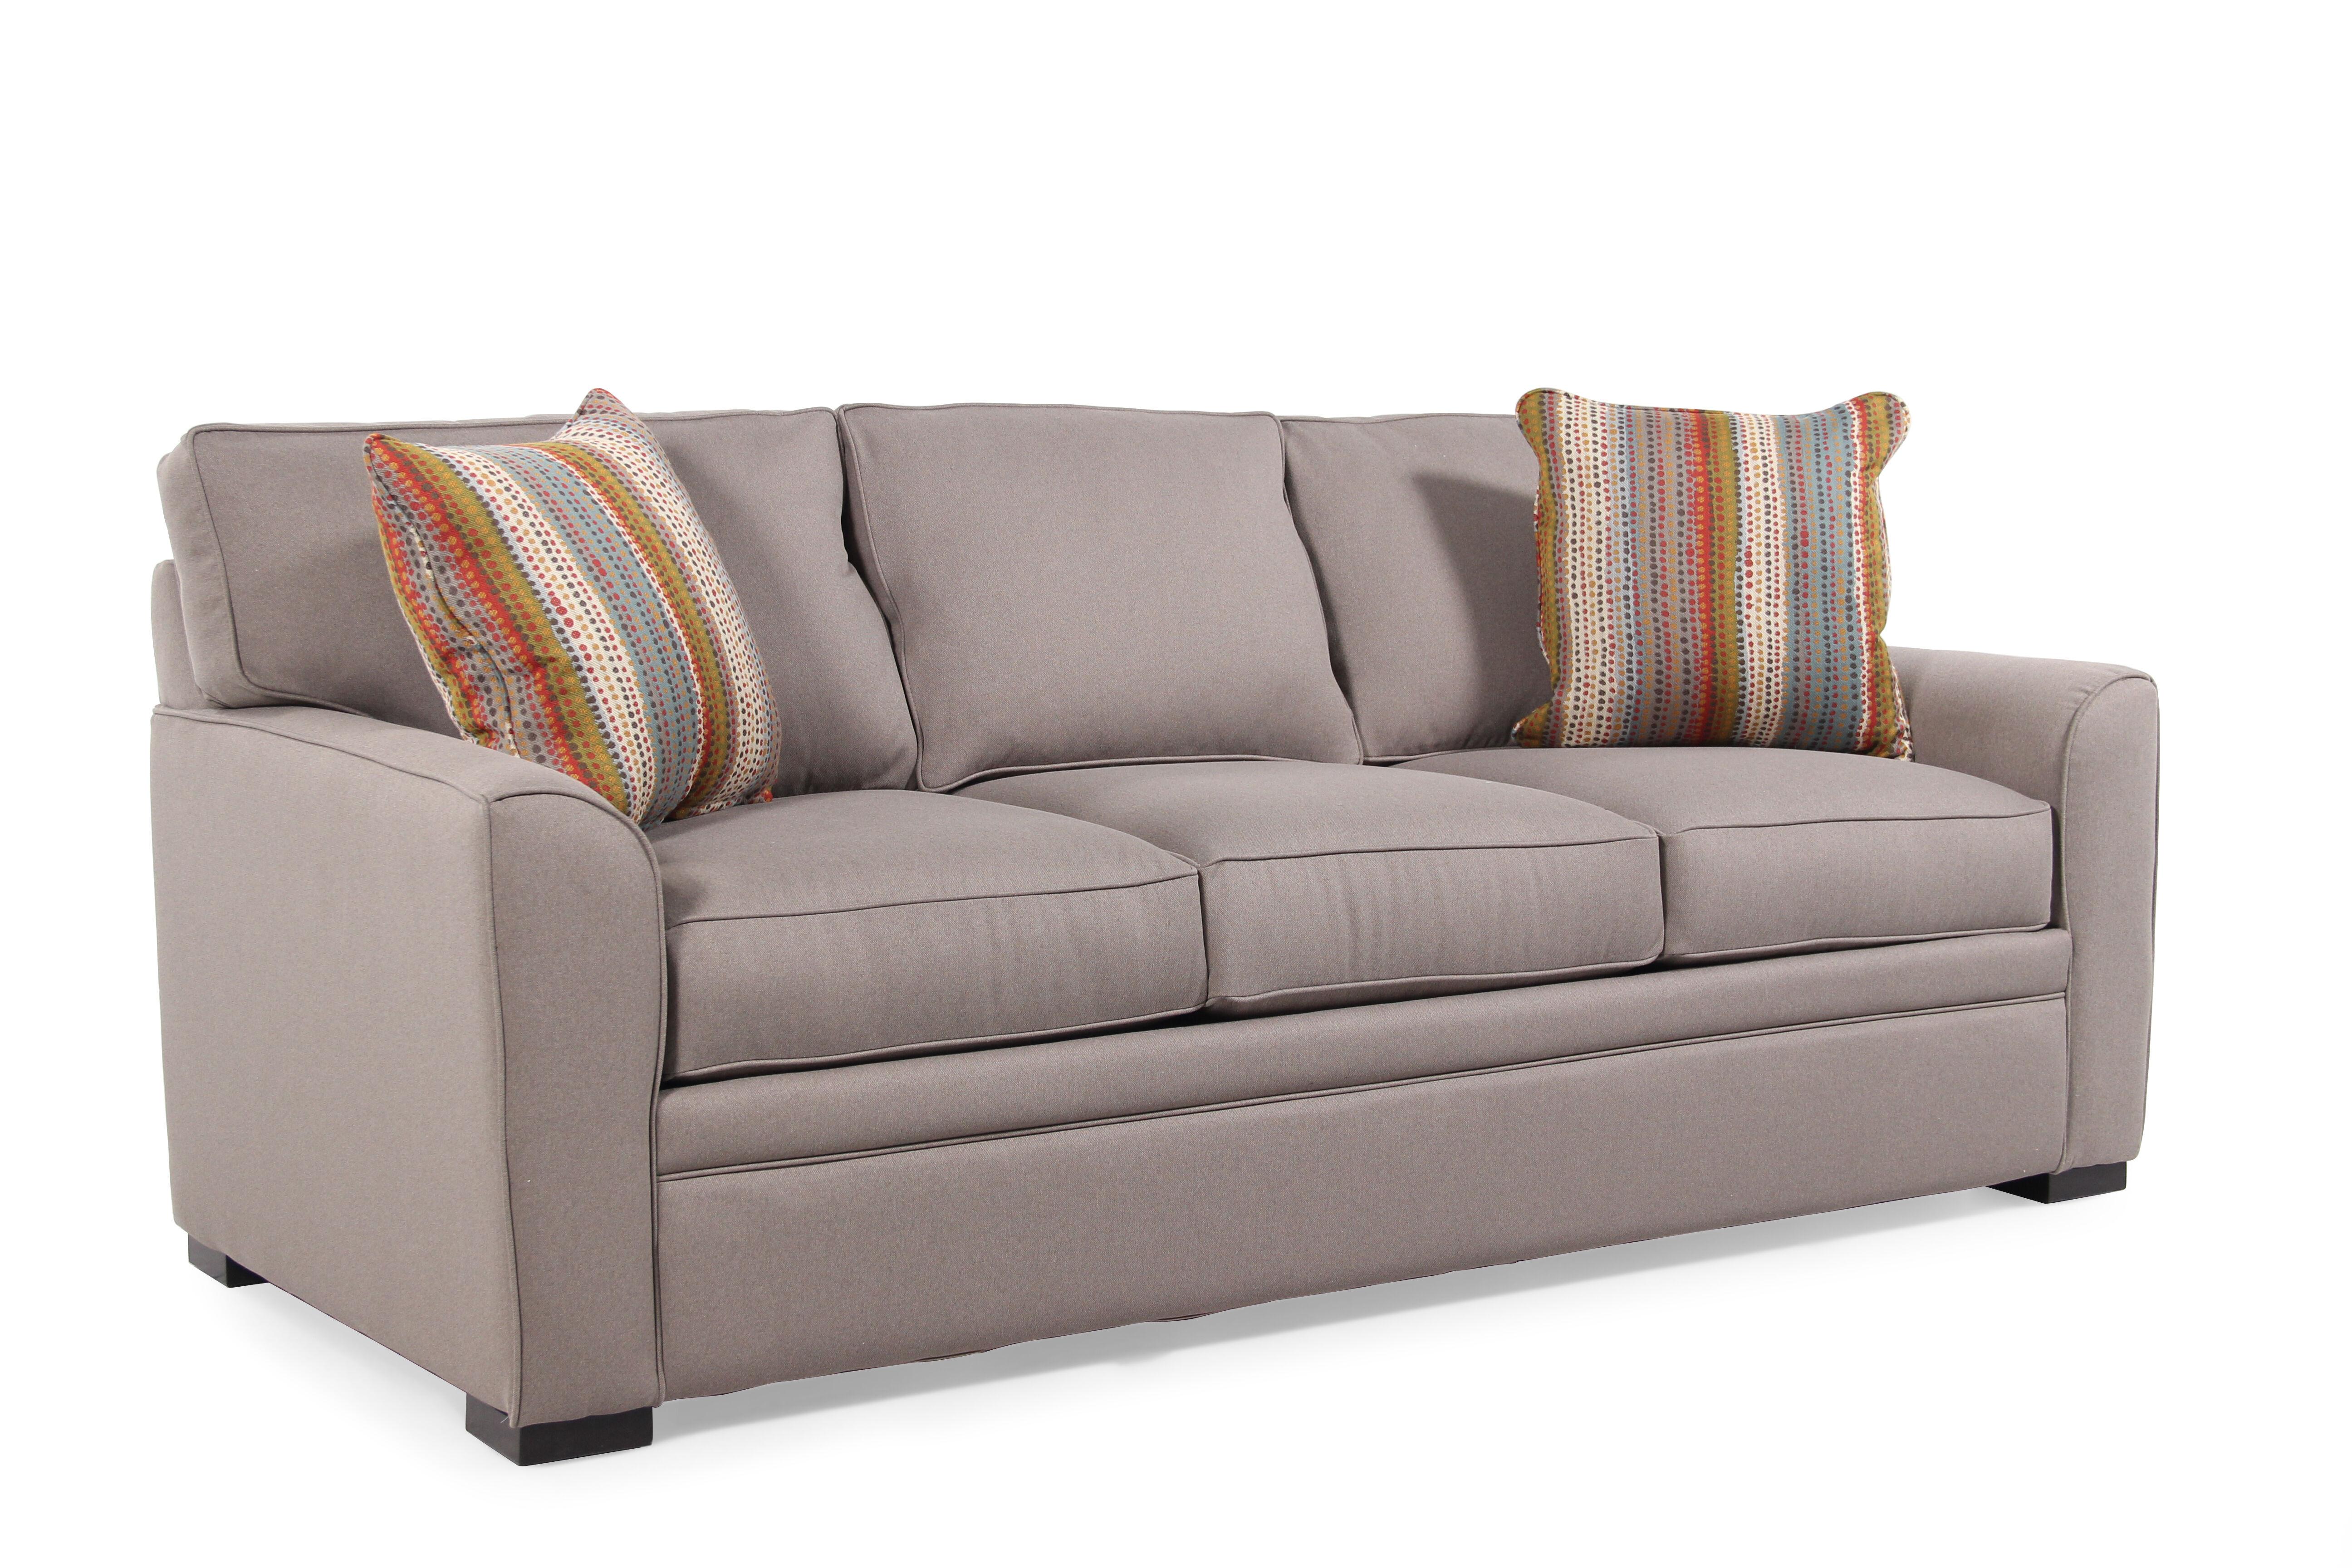 au sleeper sofa home and textiles Queen Sleeper Sofas On Sale Leather Sleeper Ottoman